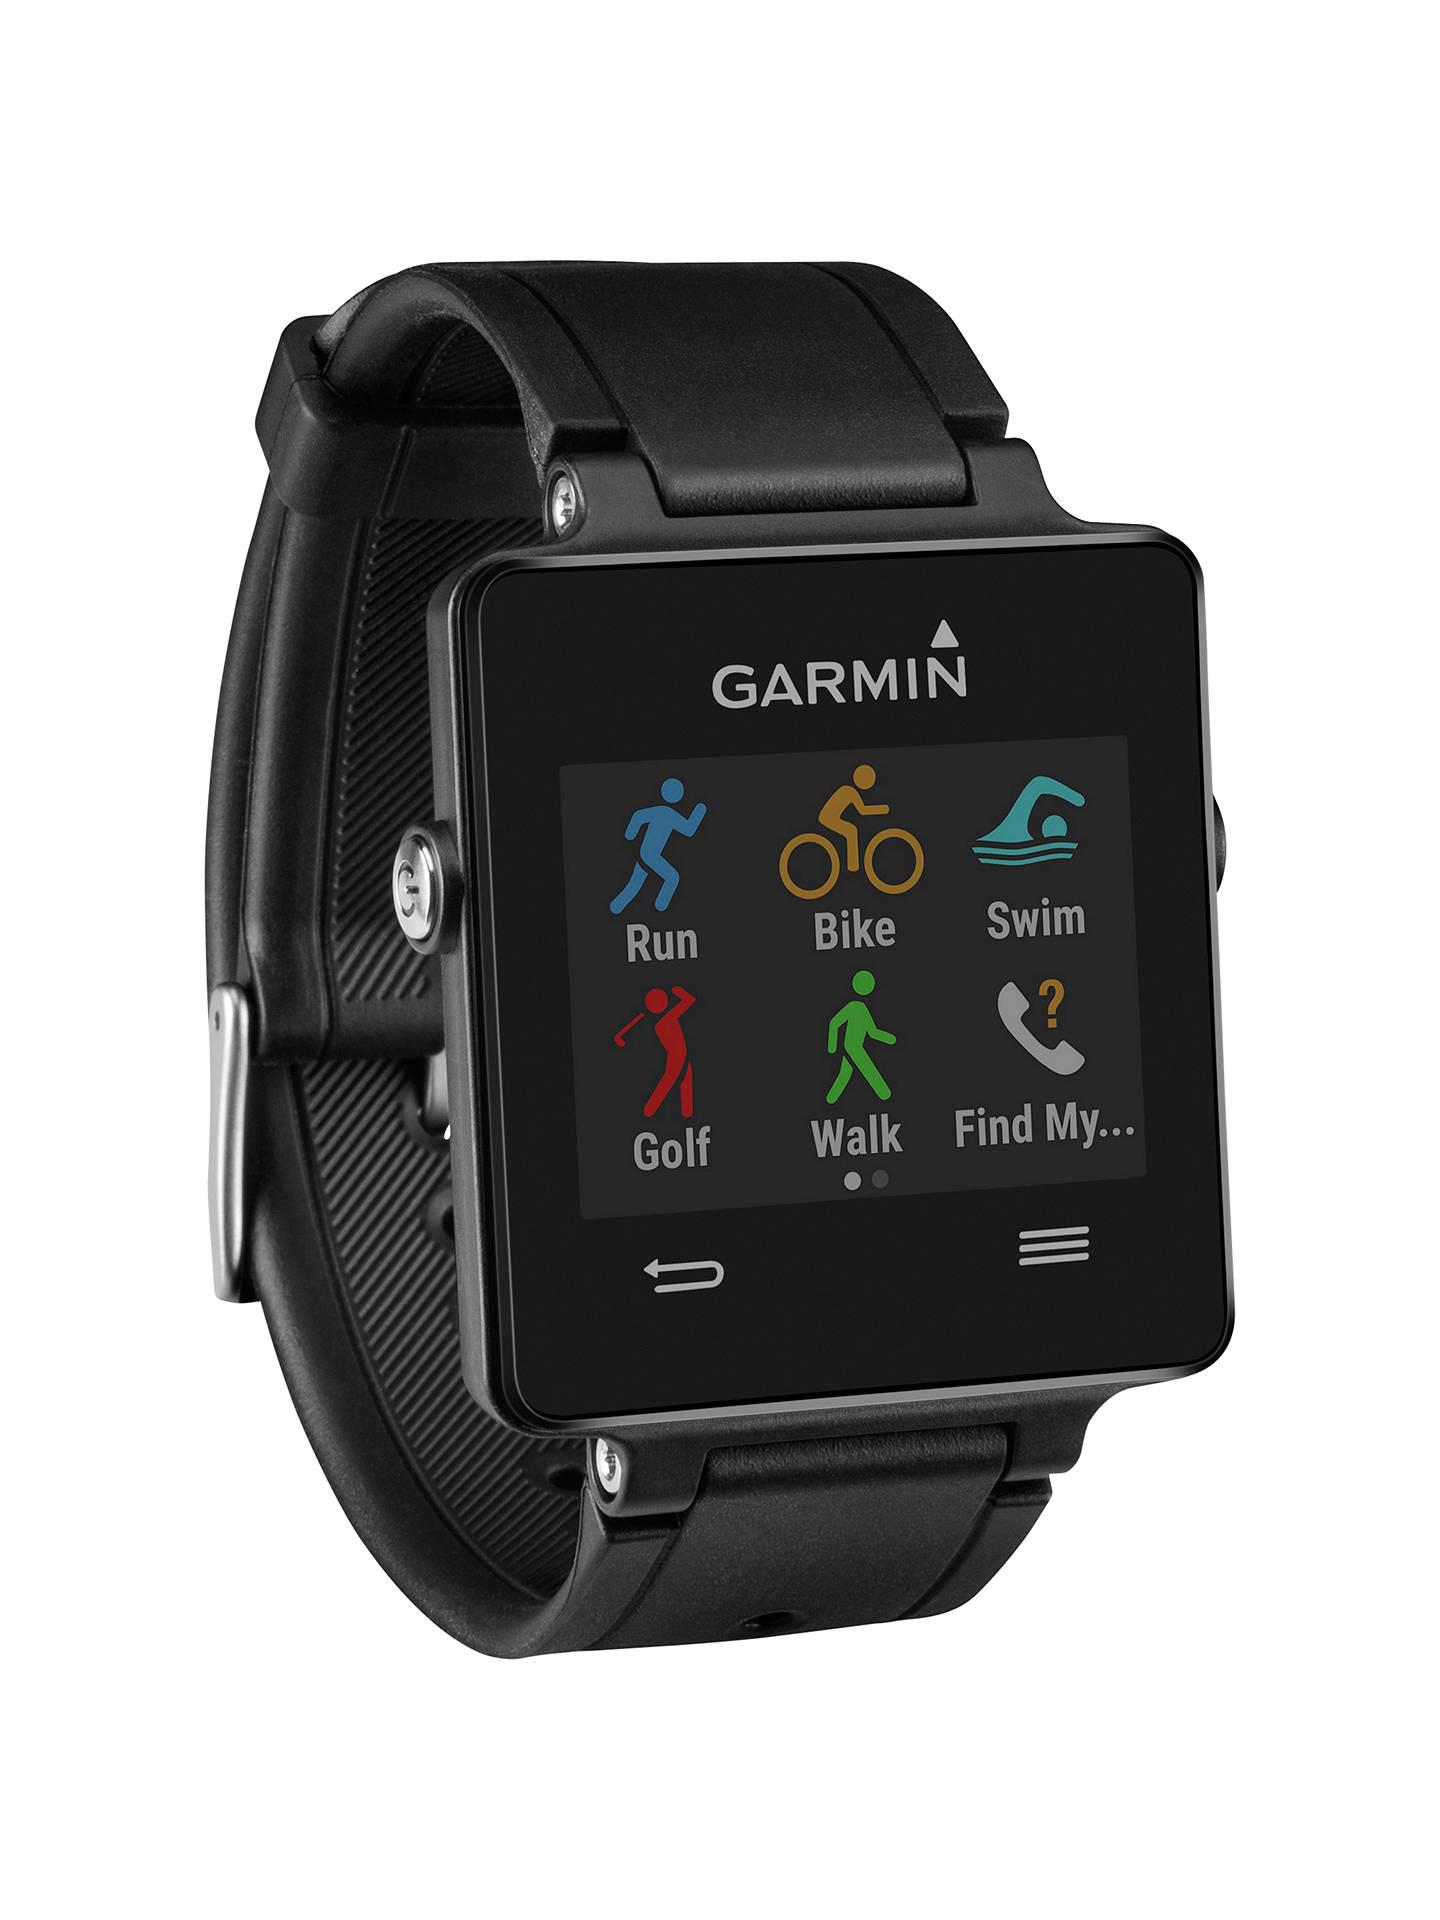 Garmin Vivoactive GPS Smartwatch and Heart Rate Monitor at